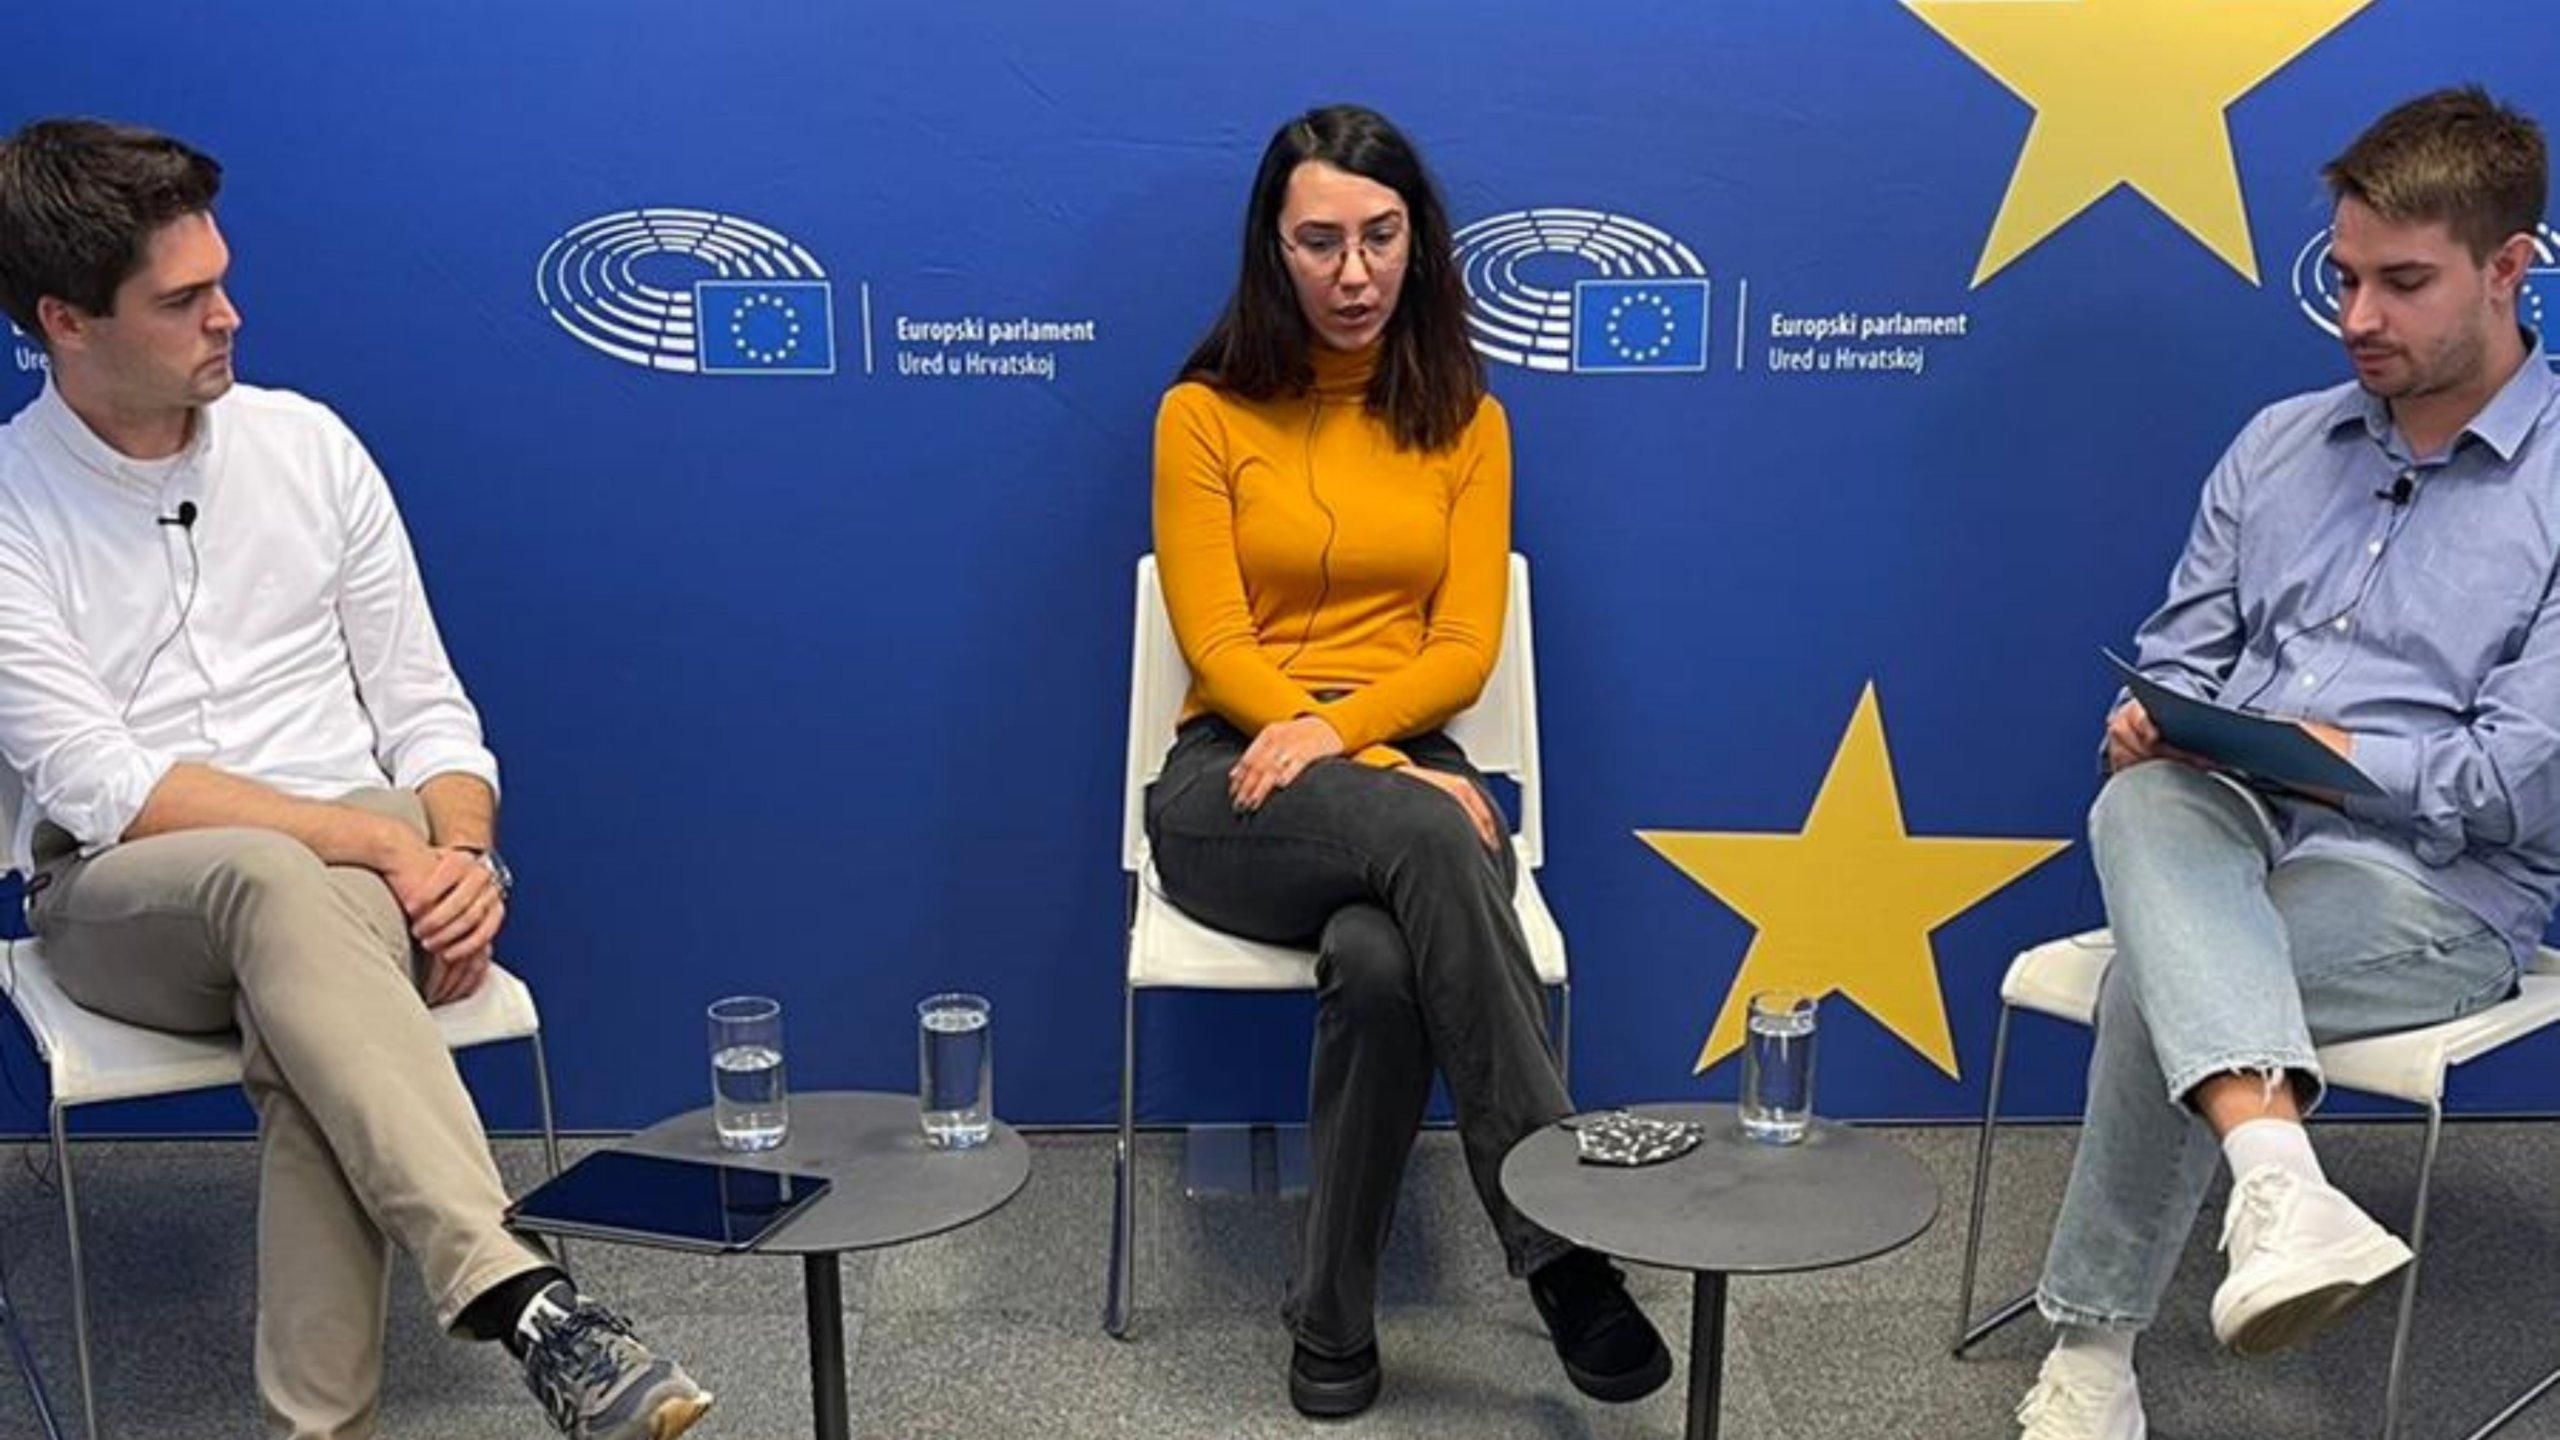 Europski parlament u Hrvatskoj Europa i mladi